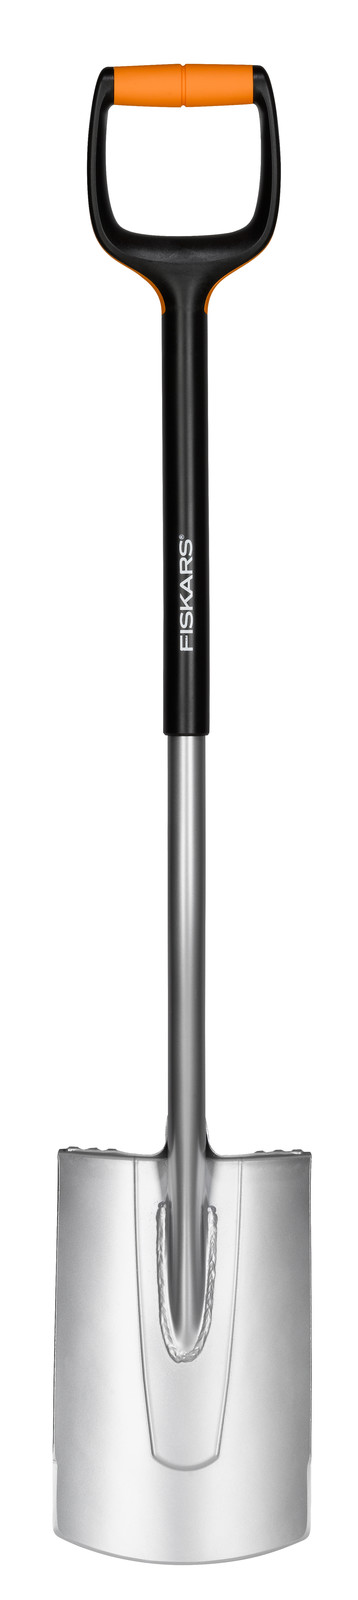 Fiskars Лопата прямая з закругленным лезвием  Xact M,   108 см, 1800г